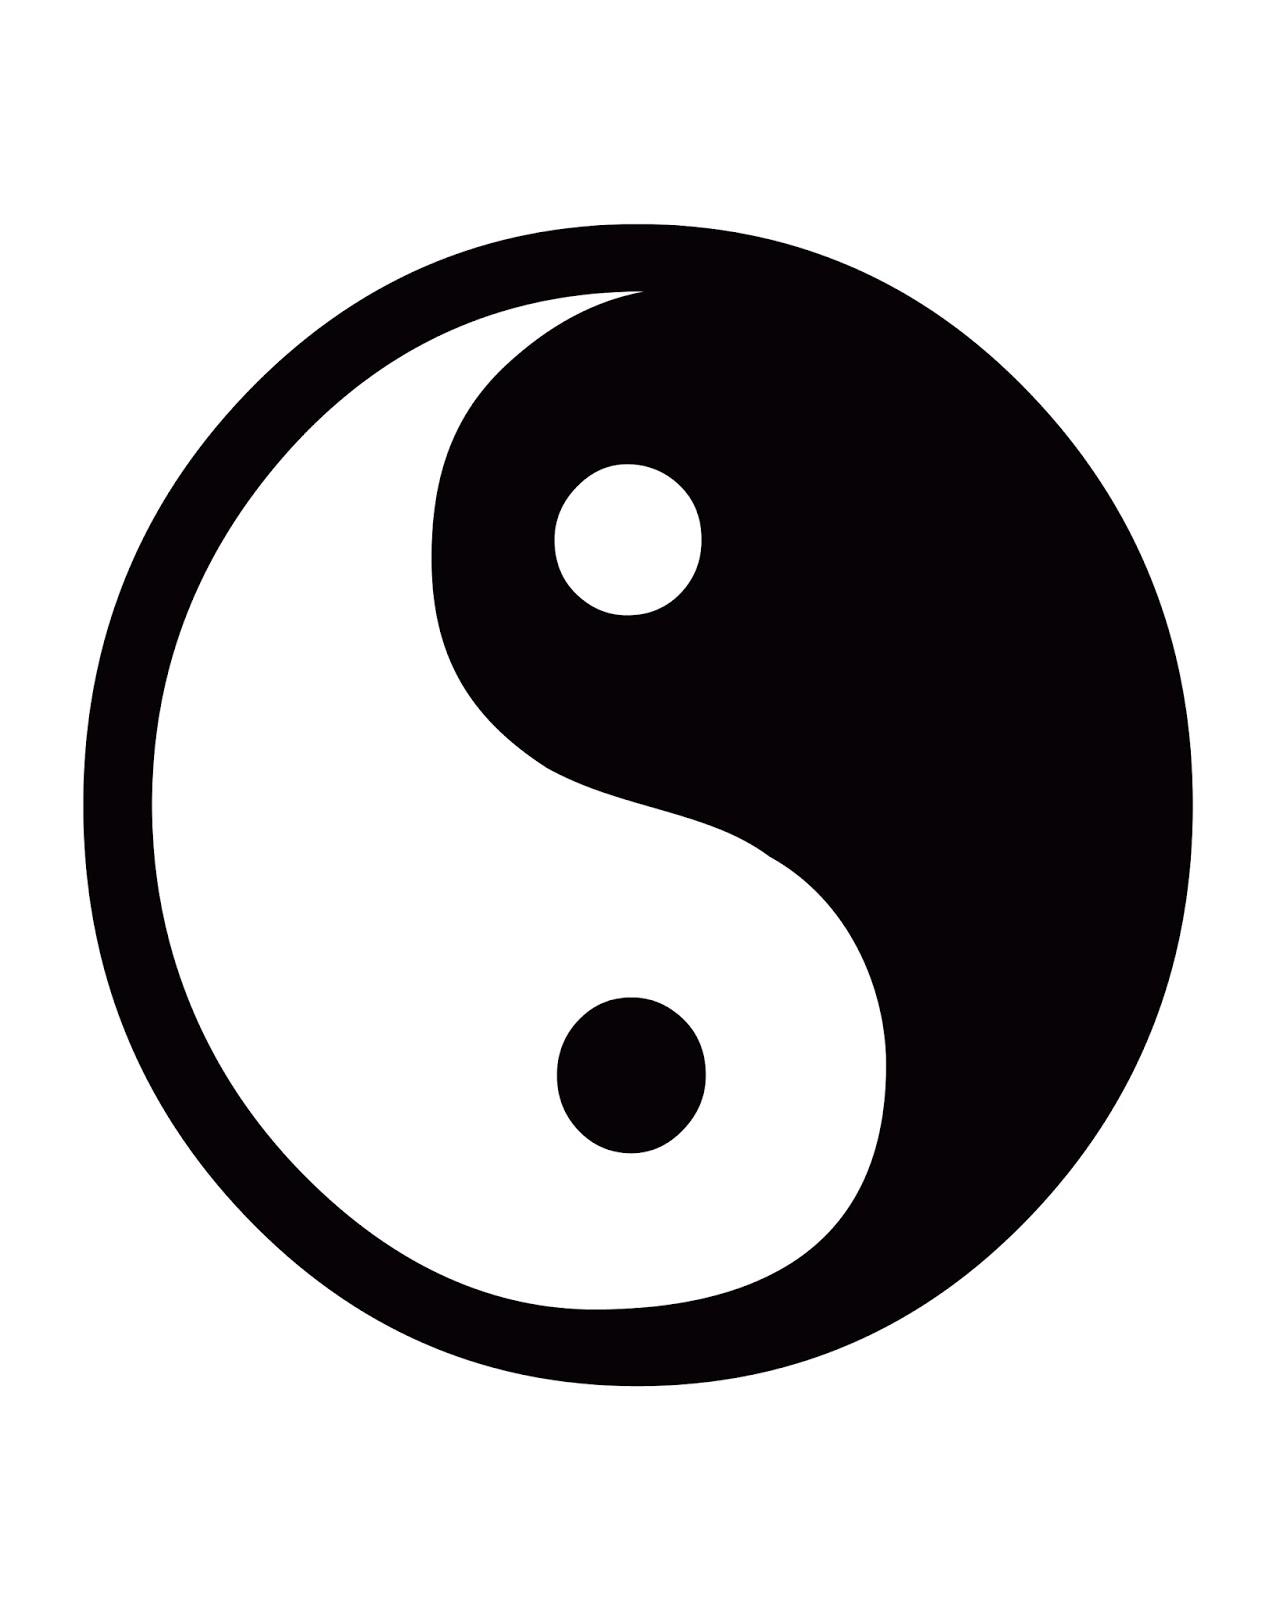 Cjo Photo Printable Black And White Art 8x10 Yin Yang Sign